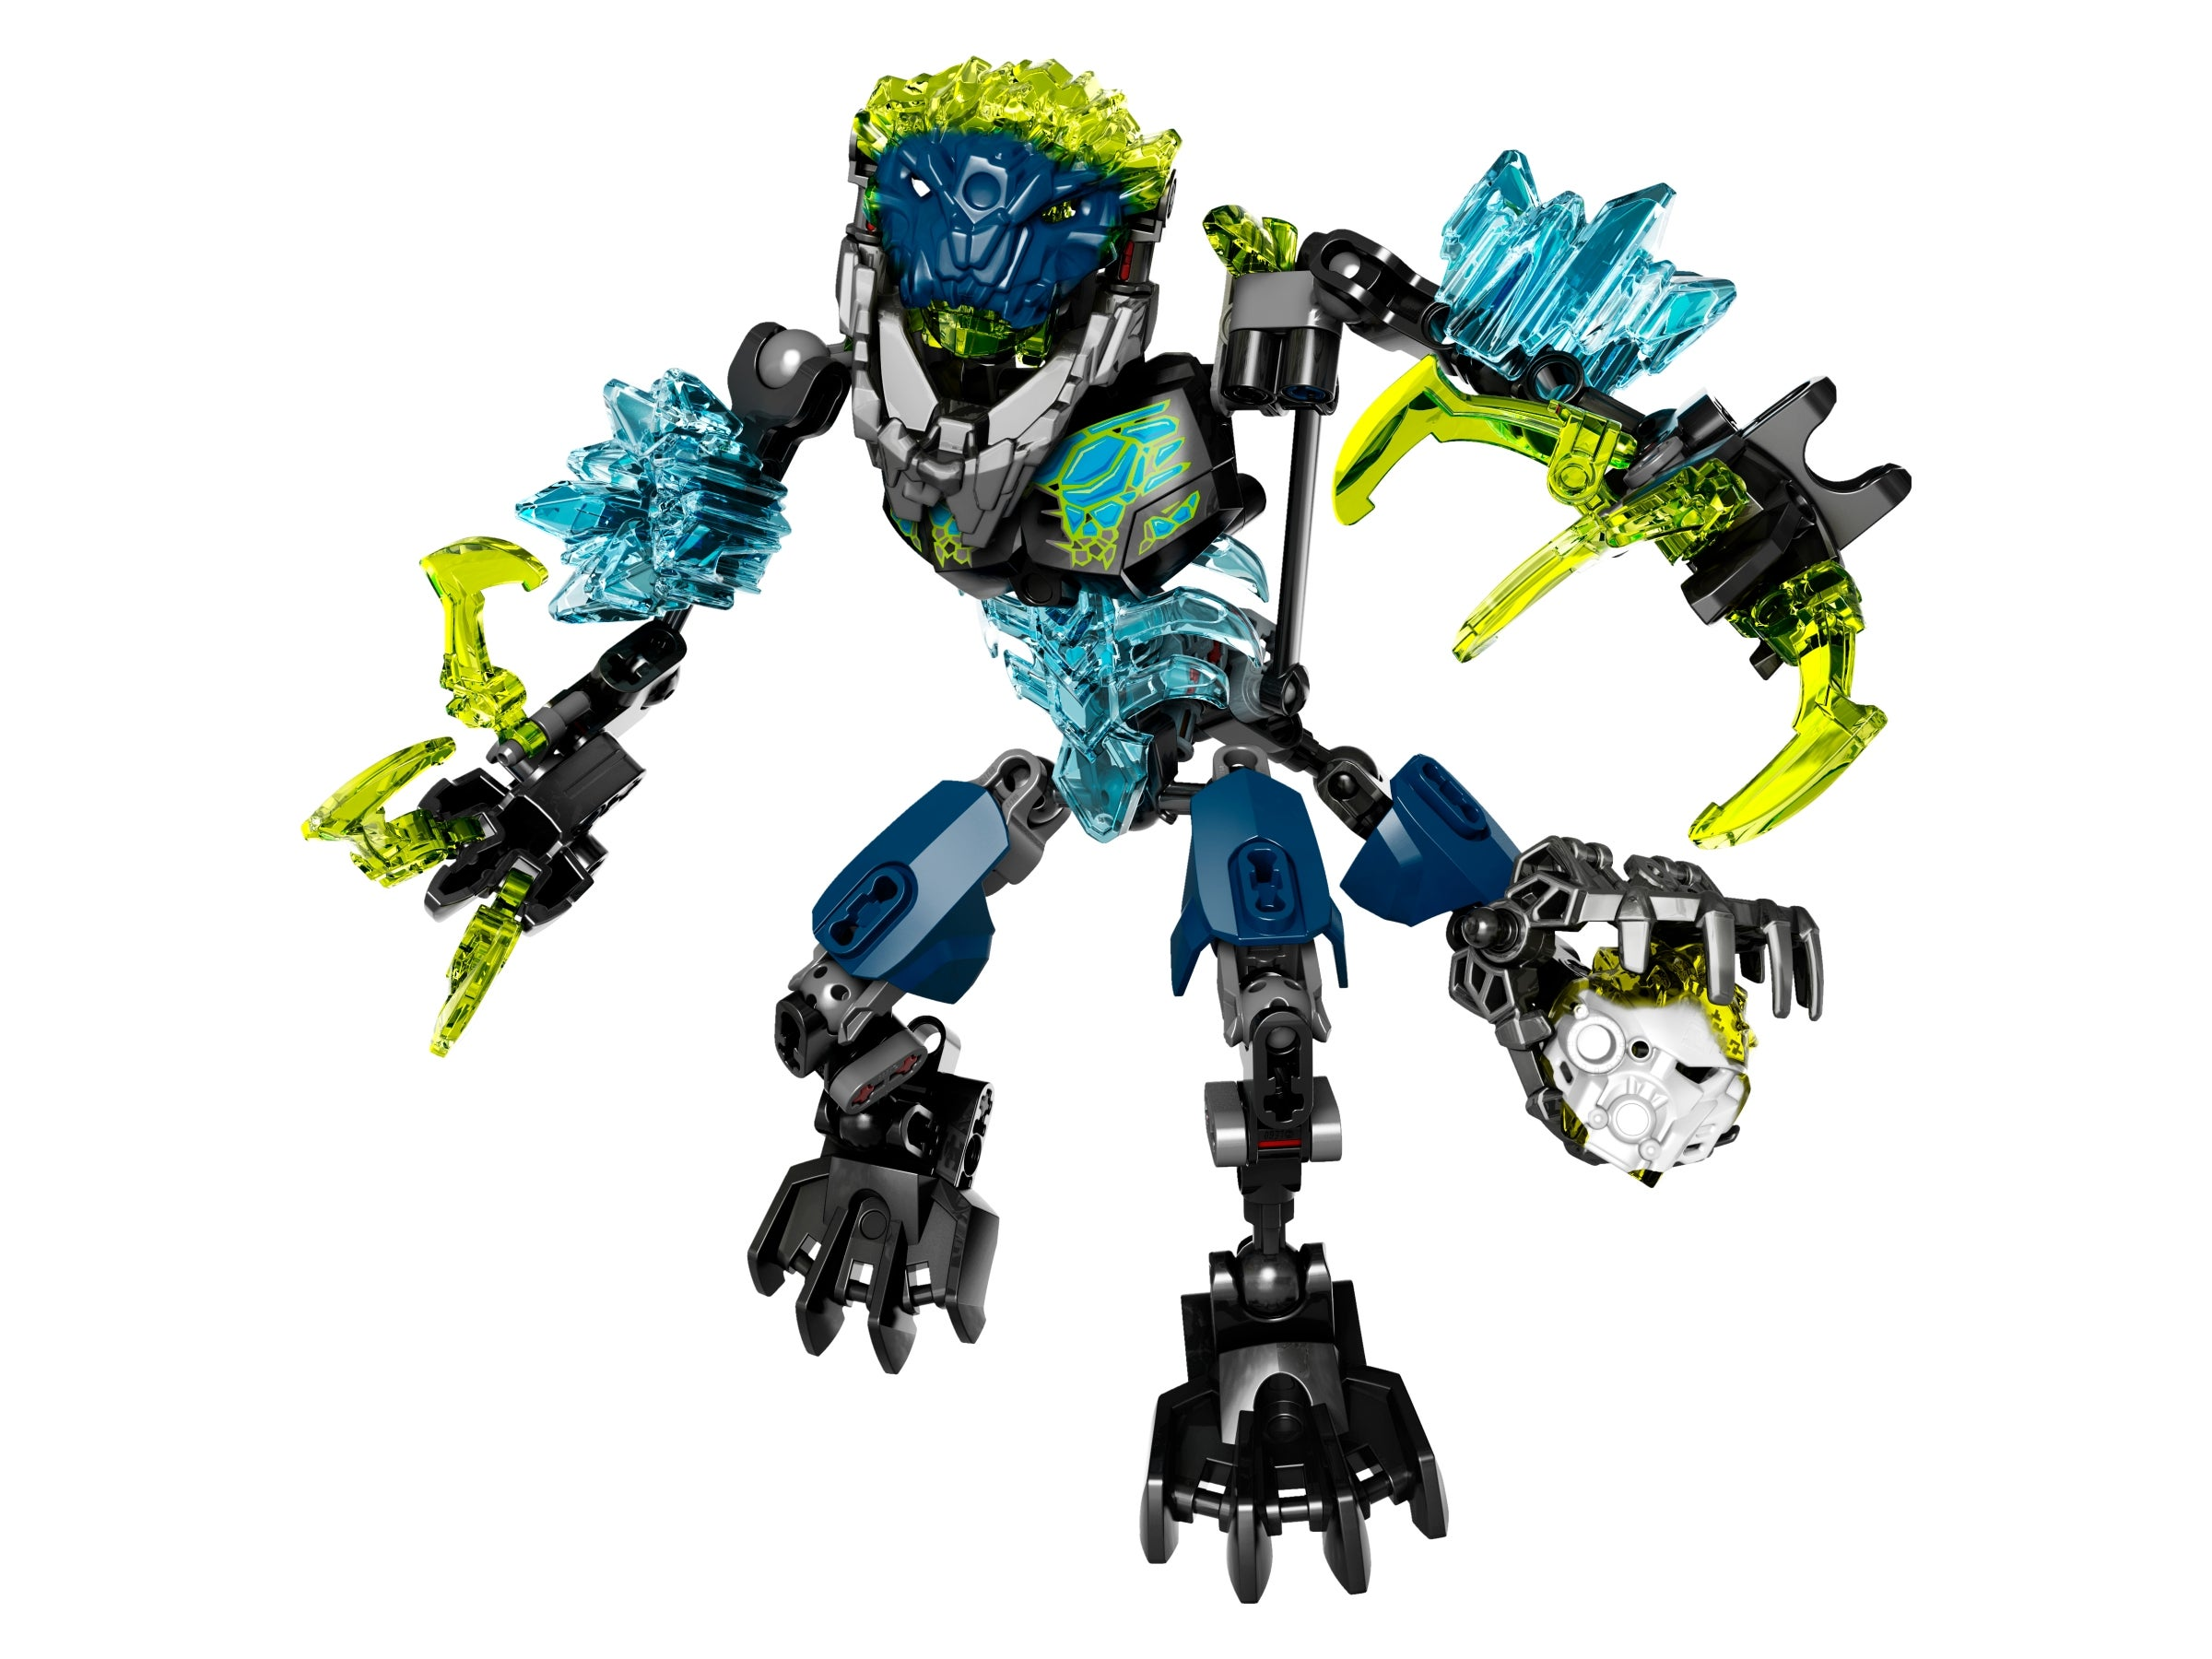 Lego Bionicle 1 Dragon Claw in Black